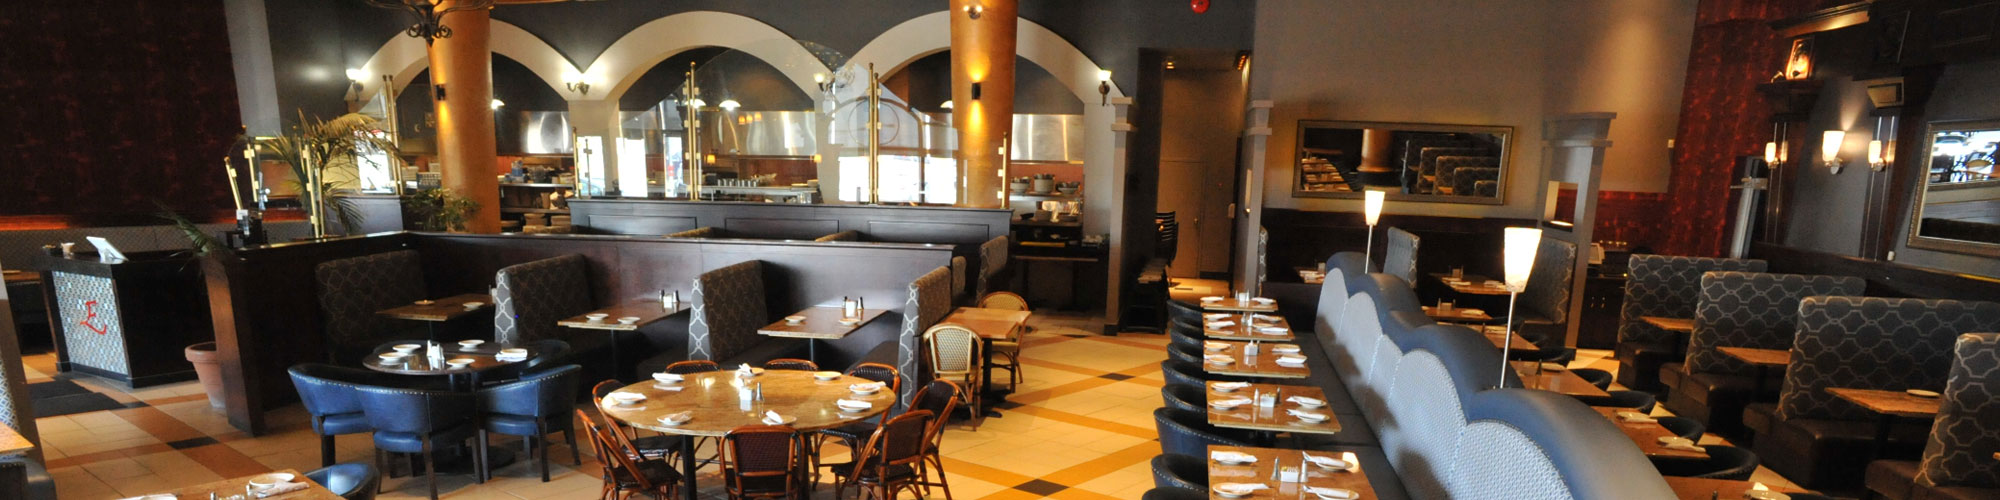 Elixor DDO dining area